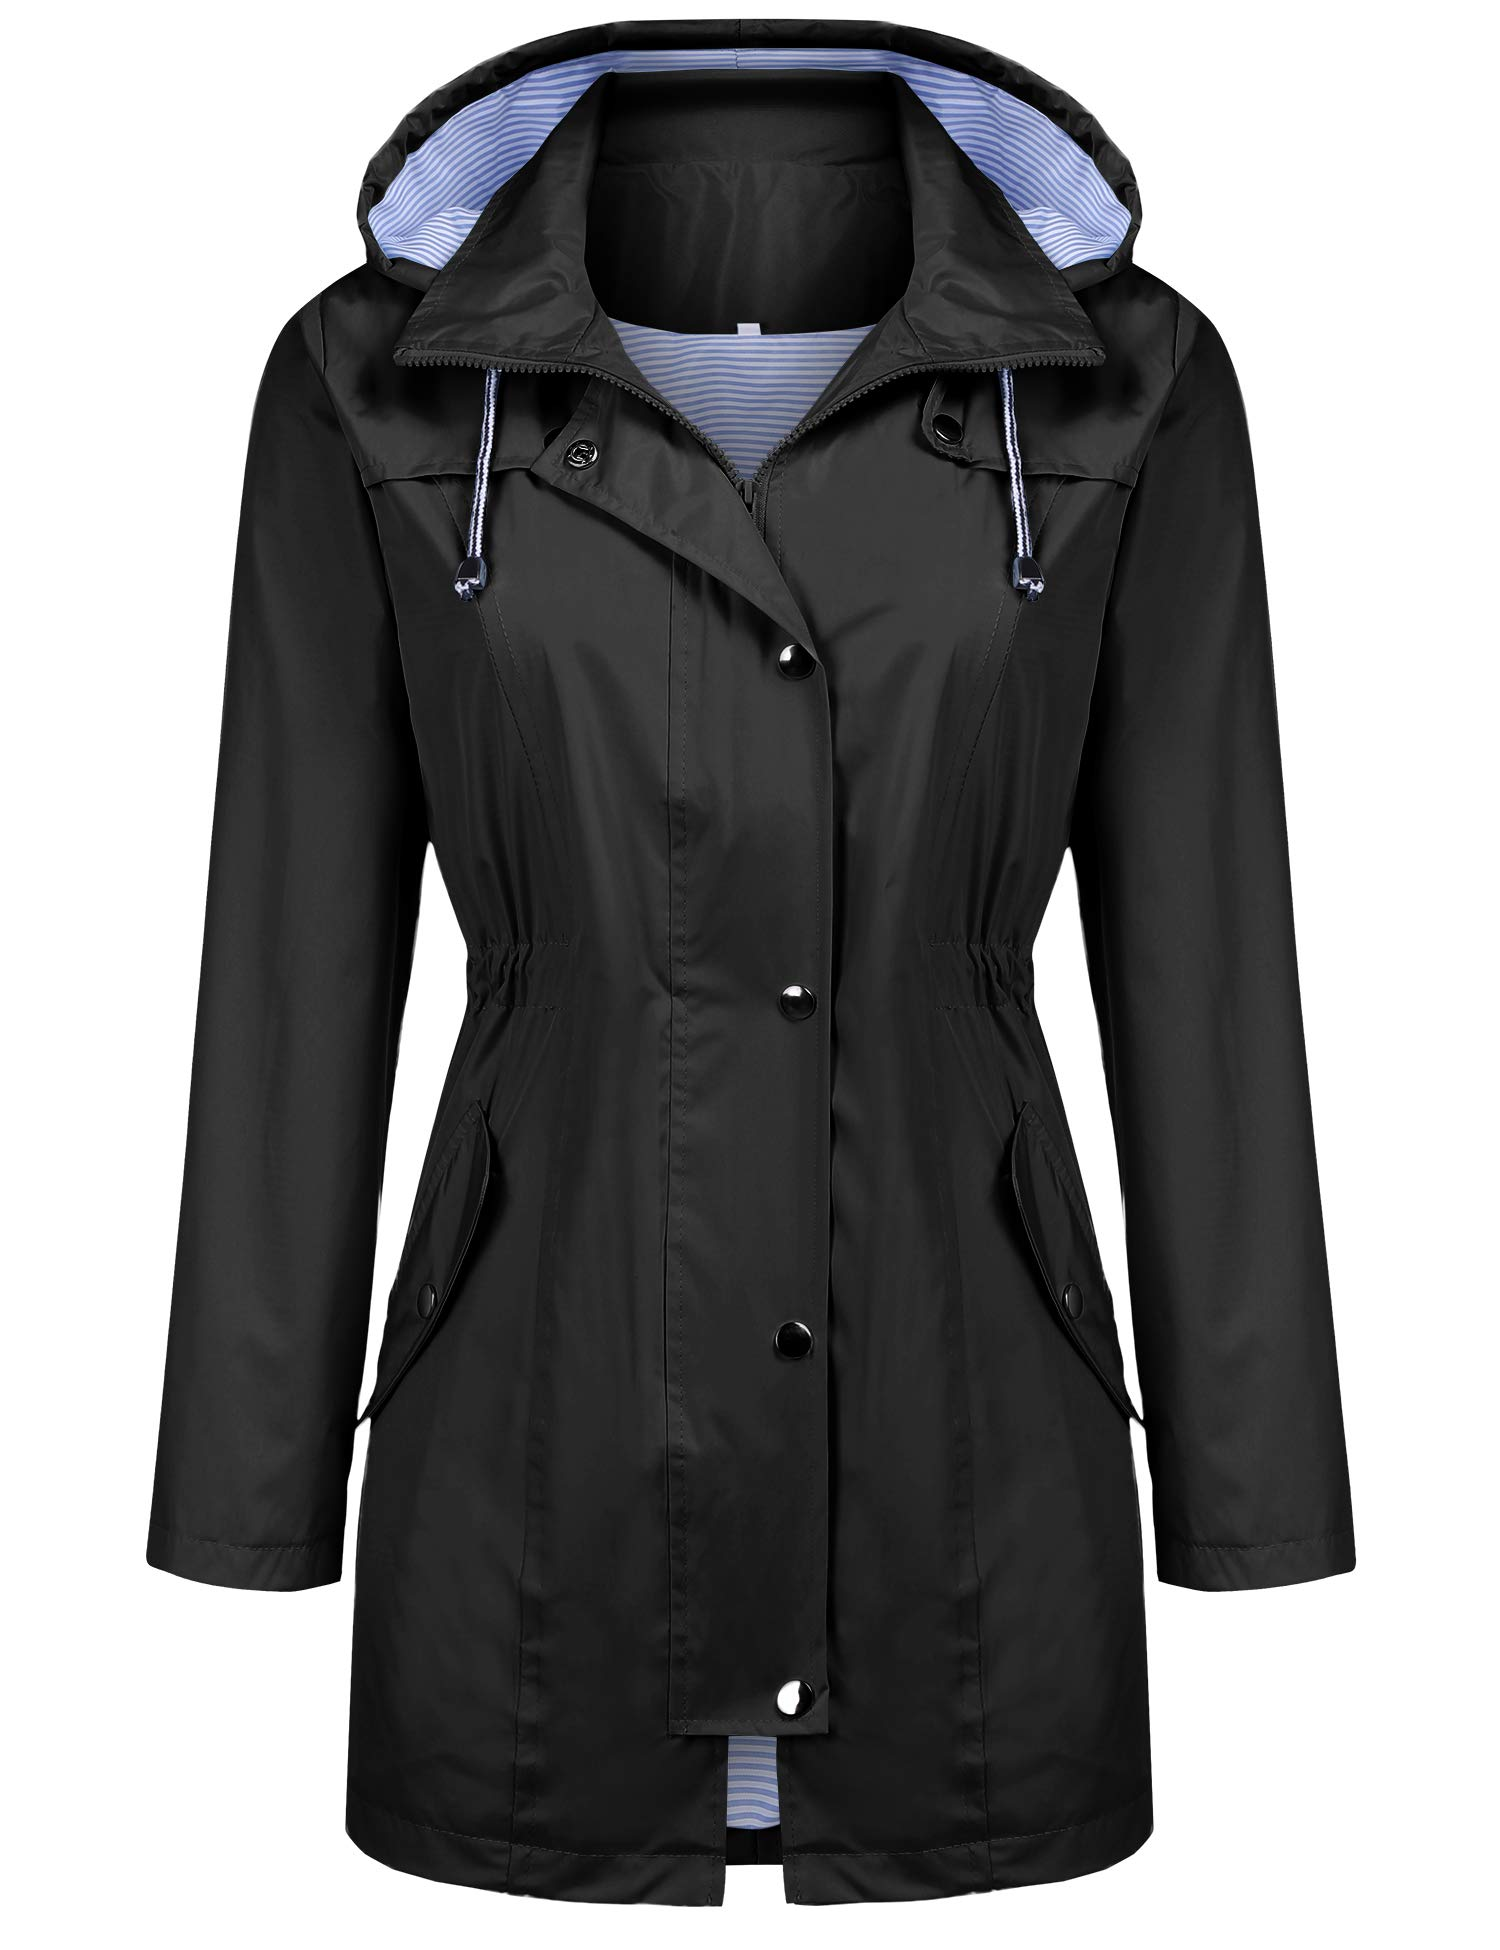 Windbreaker Jacket for Women Quick Dry Outdoor Packable Hoody Rain Clothing Black S by Kikibell